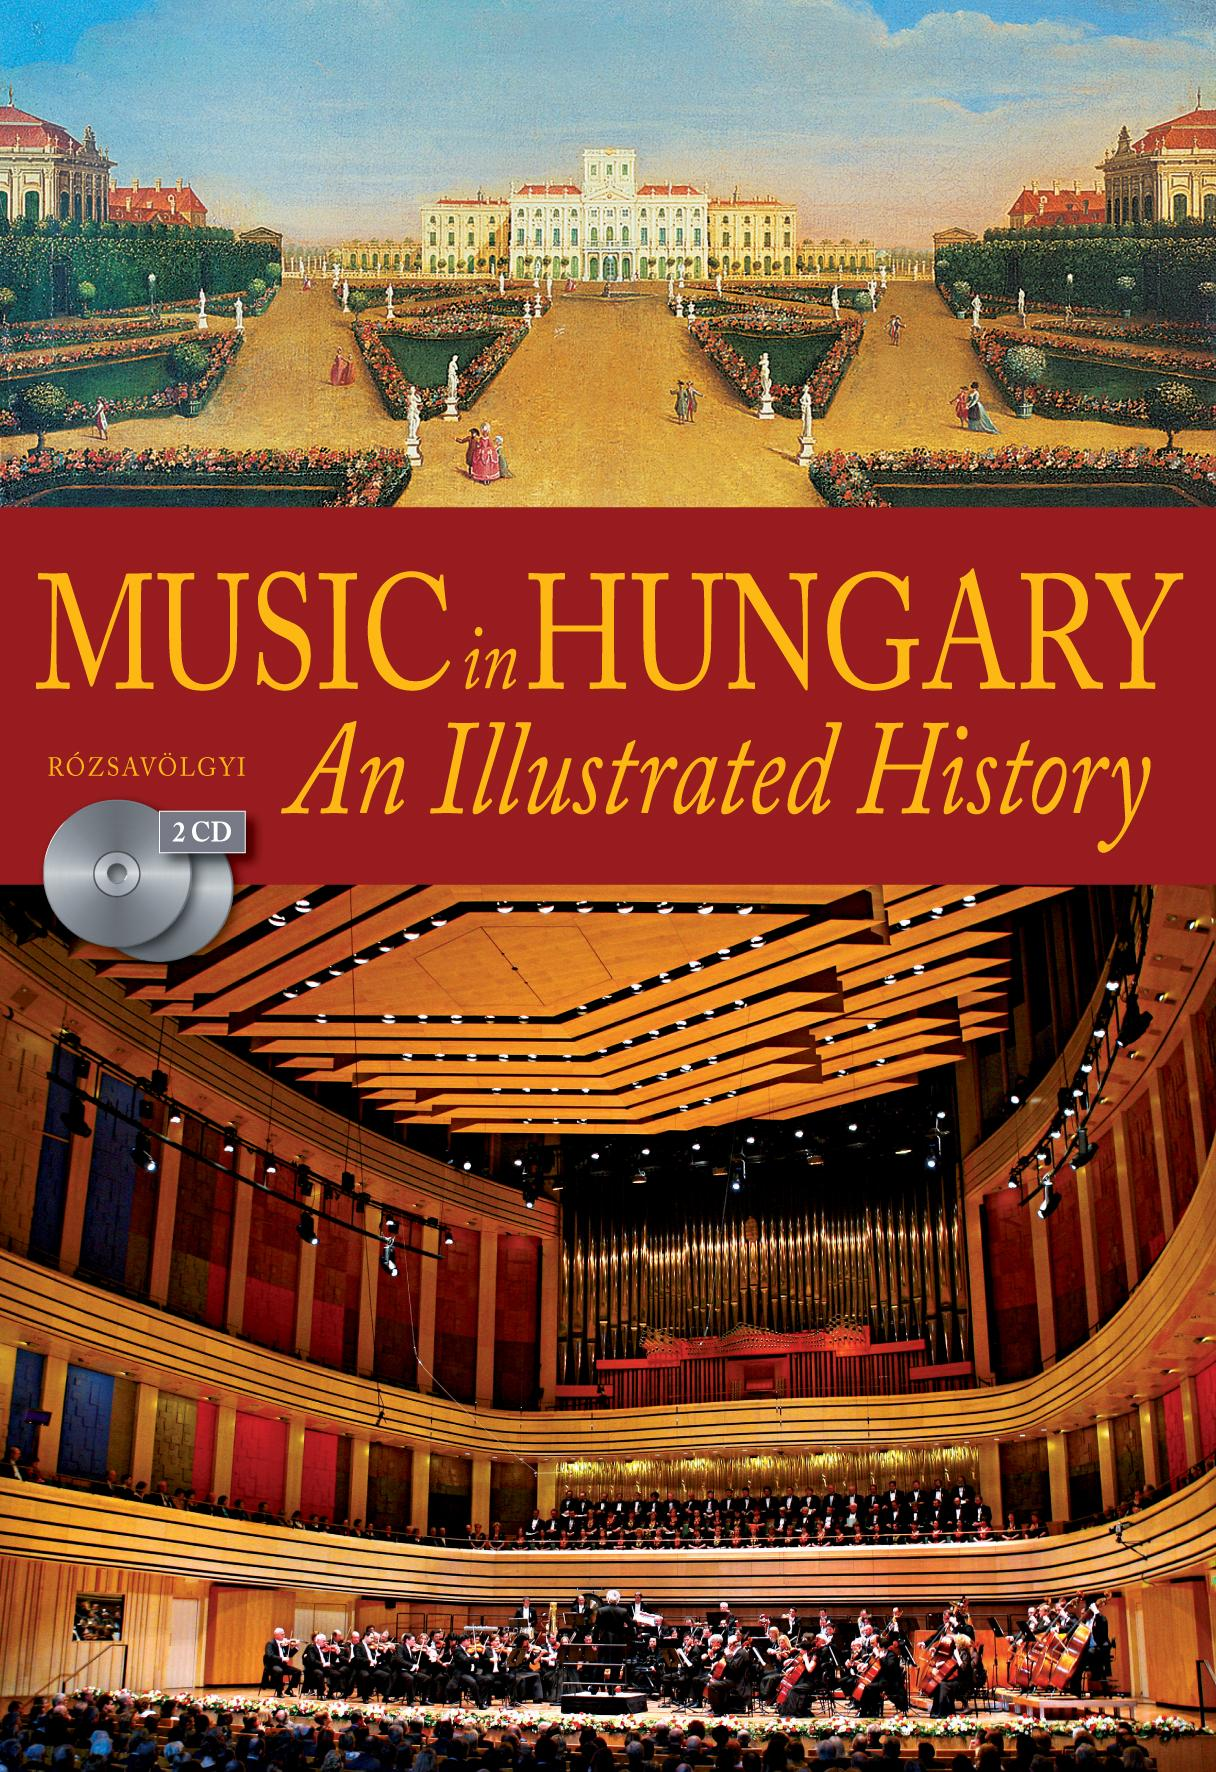 MUSIC IN HUNGARY - AN ILLUSTRATED HISTORY - 2 CD-VEL (MAGYAR ZENETÖRTÉNET)